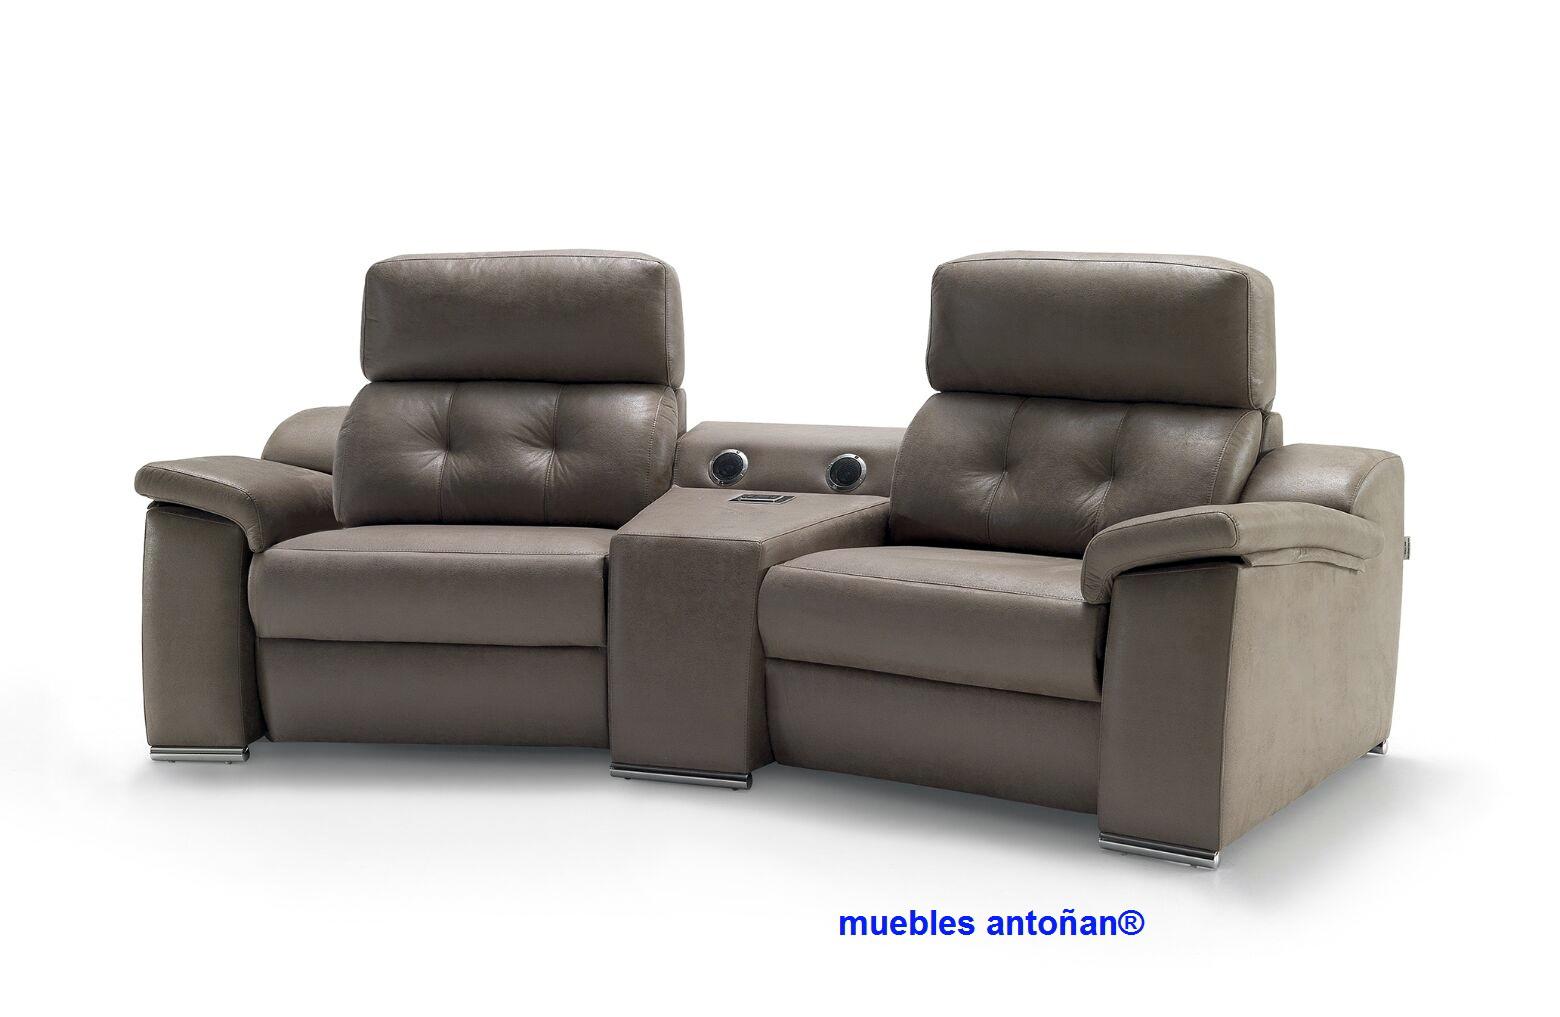 Coimbra sof relax motorizado by verazzo design muebles for Sofas relax con motor